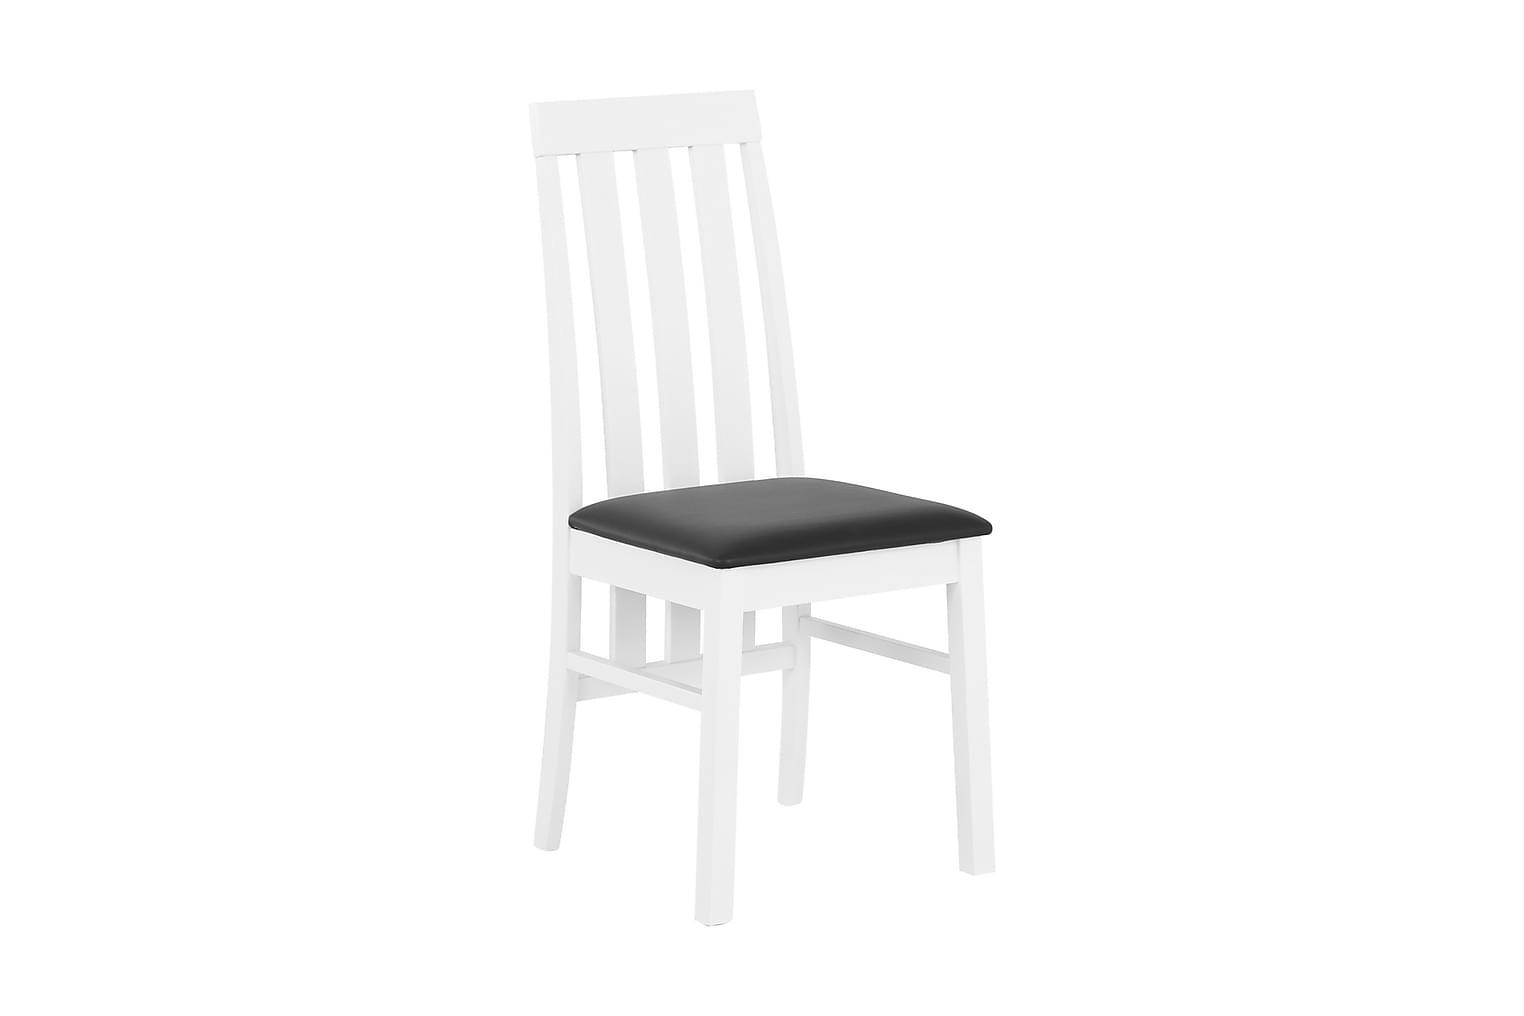 BORGHOLM Tuoli Valkoinen/Musta PU